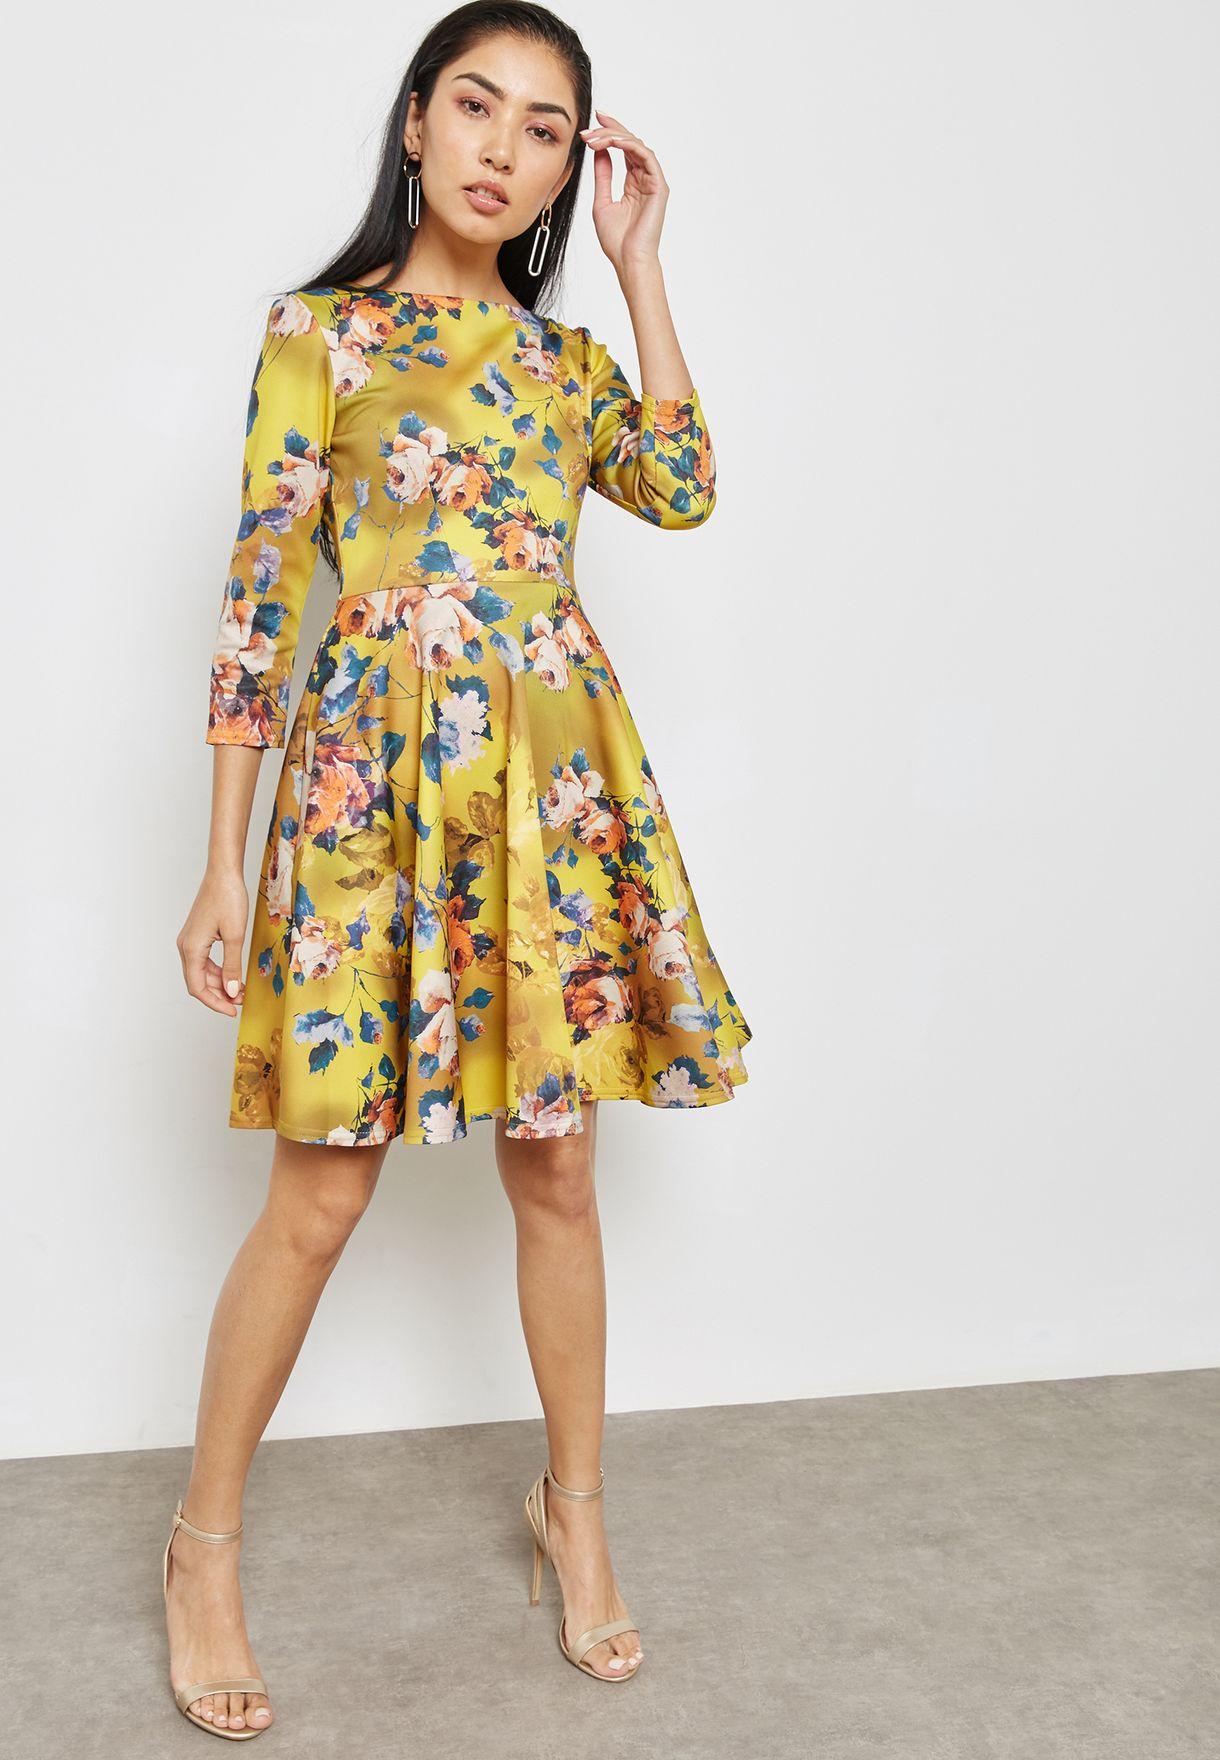 84c28c90733 Shop Closet prints Scuba Skater Dress JD3196 for Women in UAE ...